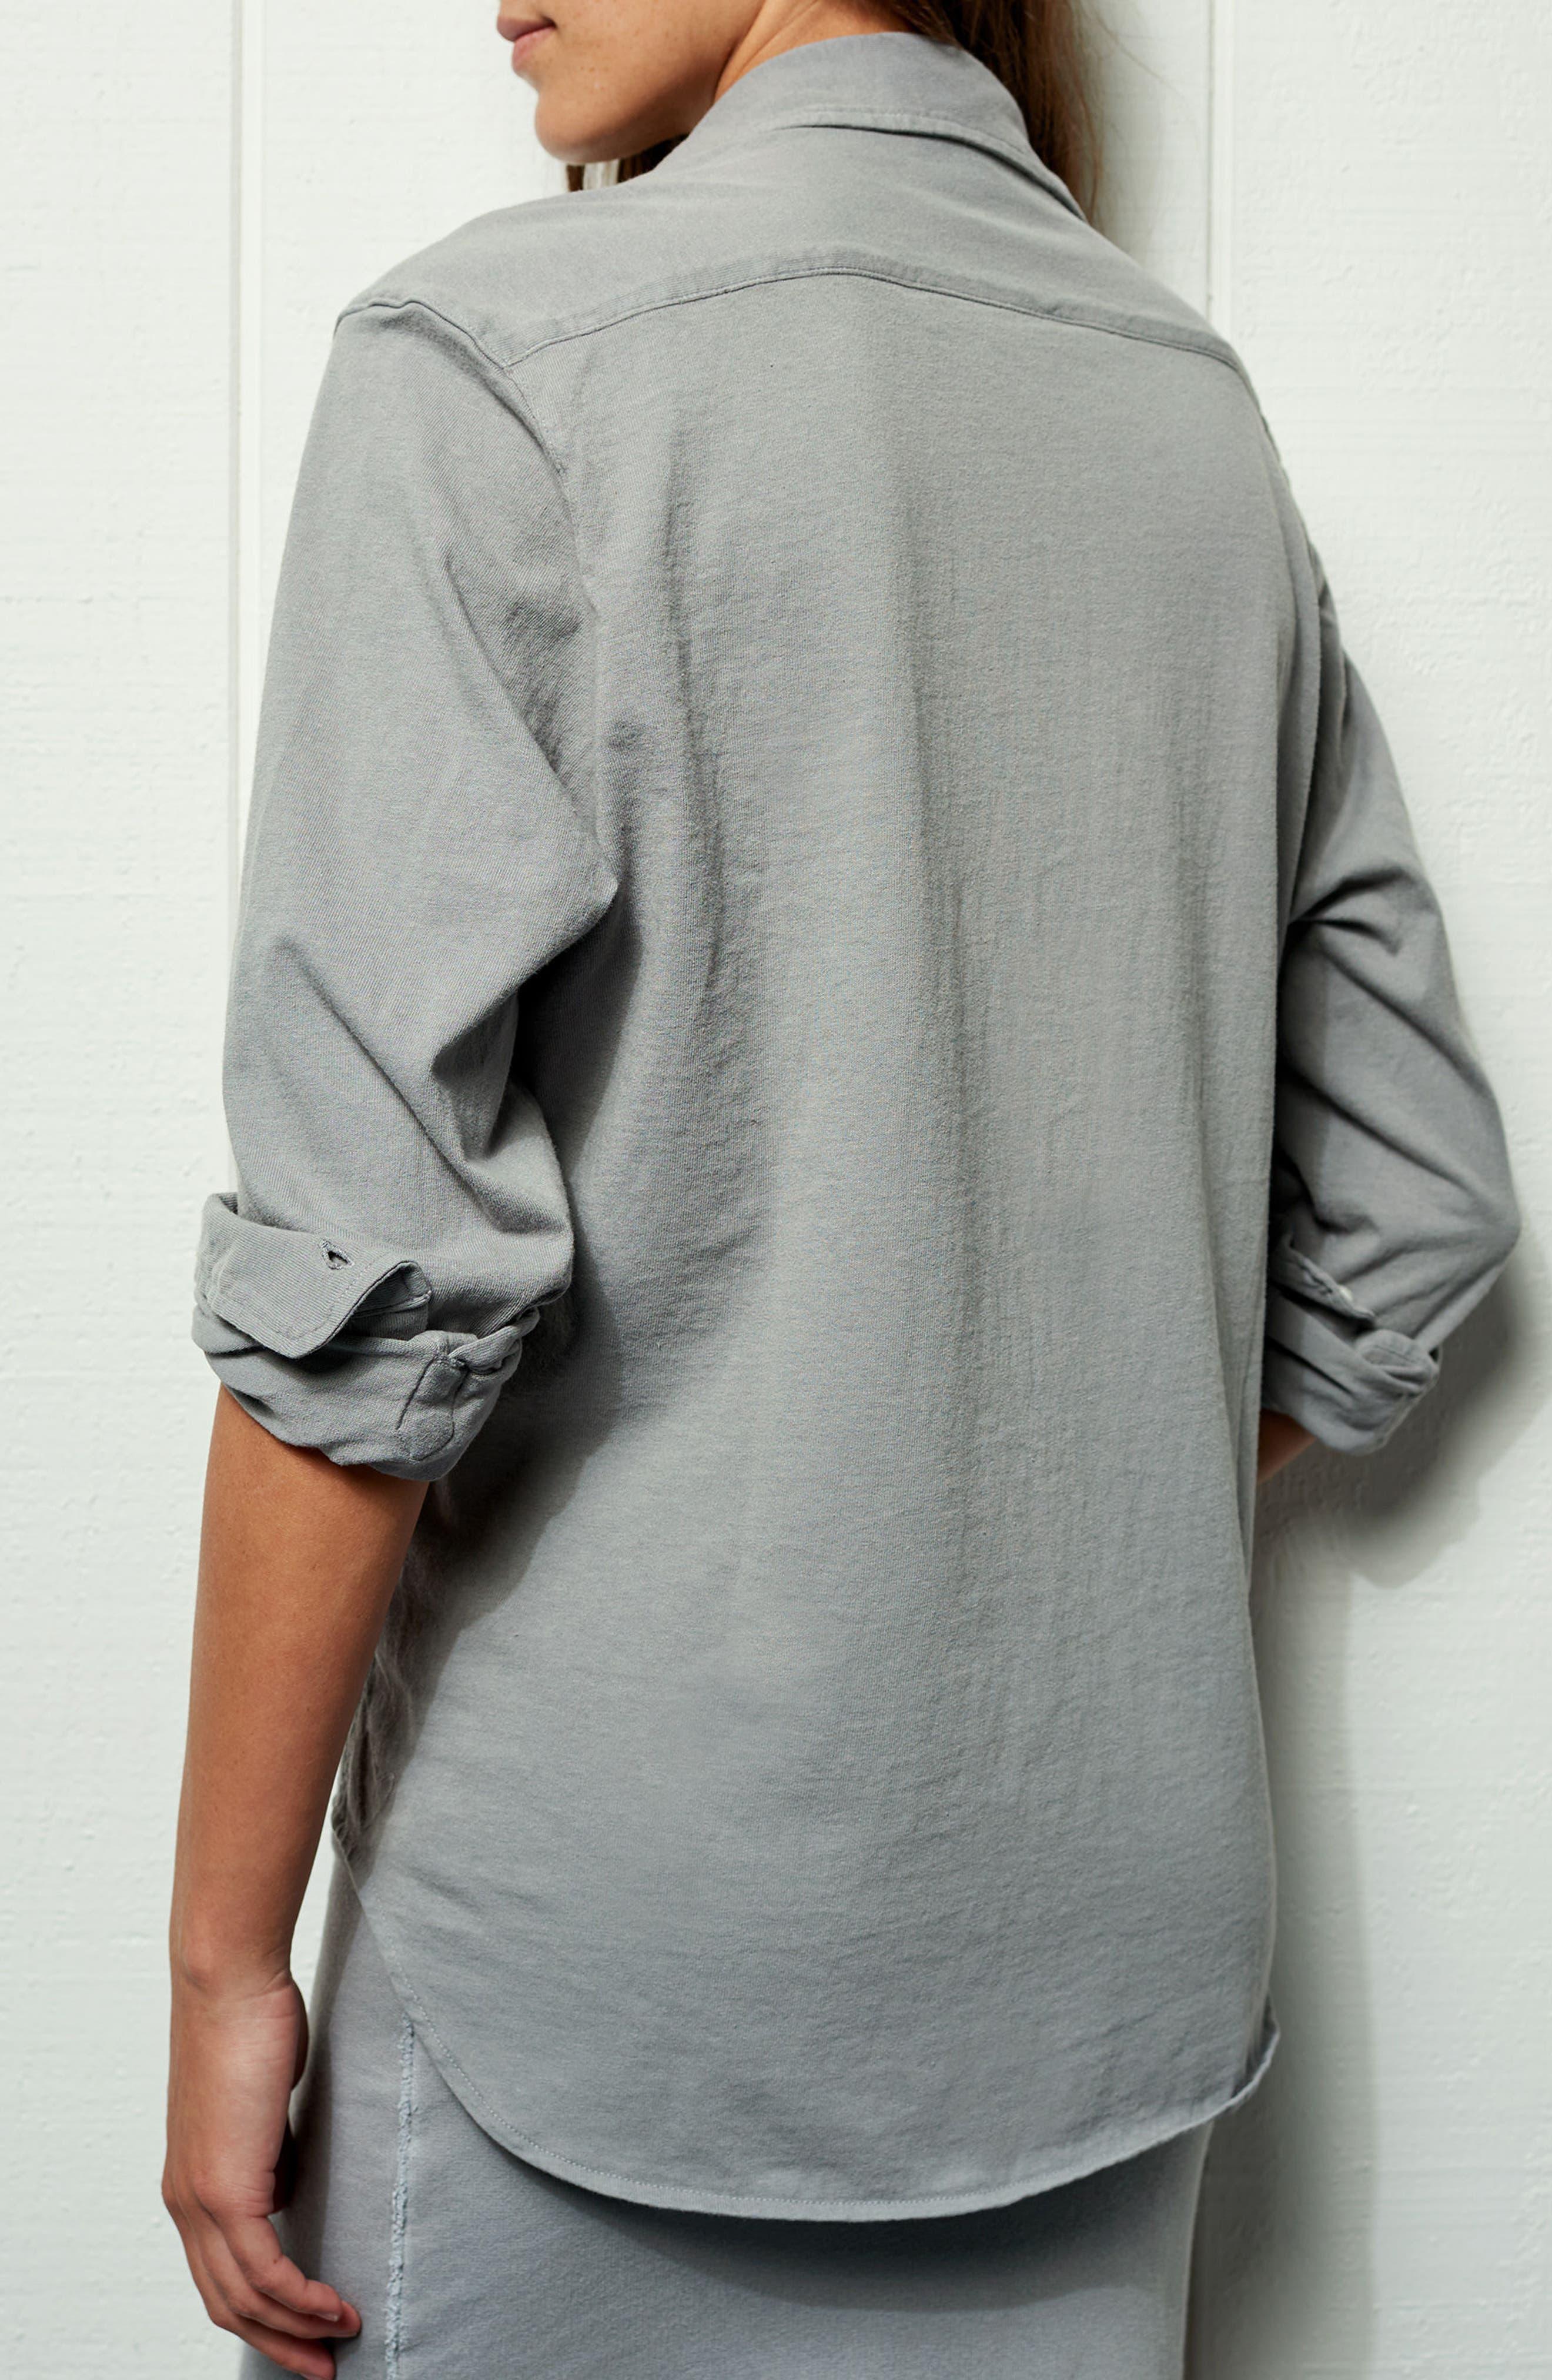 Tee Lab Knit Button Down Shirt,                             Alternate thumbnail 7, color,                             037